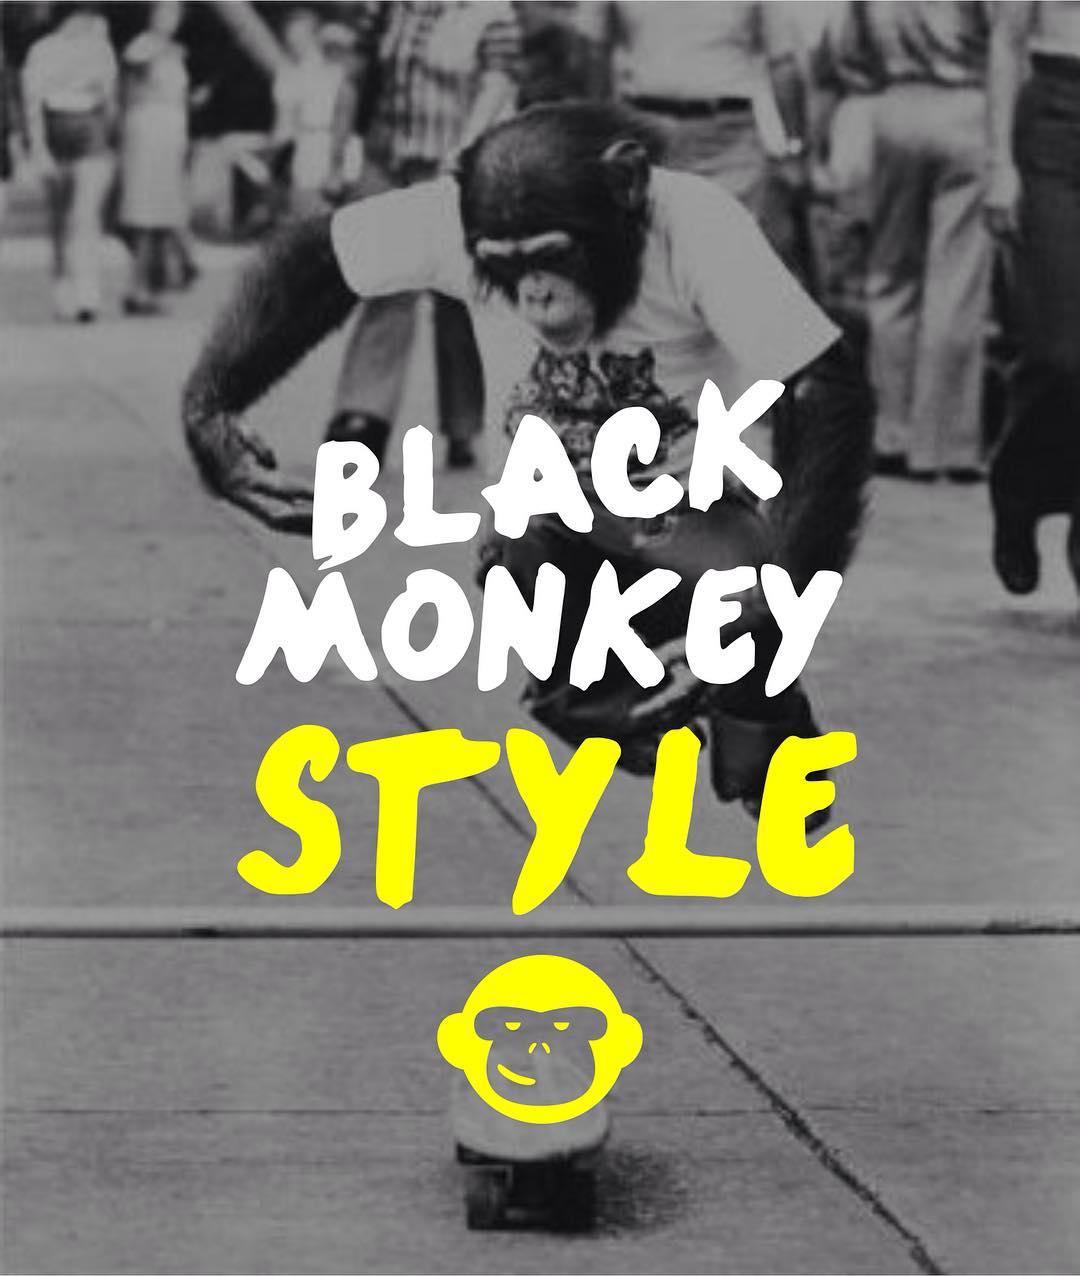 Para este Miércoles de mucho calor, Black Monkey Style!  Cap & Alpargatas con onda  @blackmonkeystore #alpargatas #handmade #style #argentina #design #cap #gorras #monkeybrand #miercoles #verano #calor #summerstyle #picoftheday #photoofday #look...